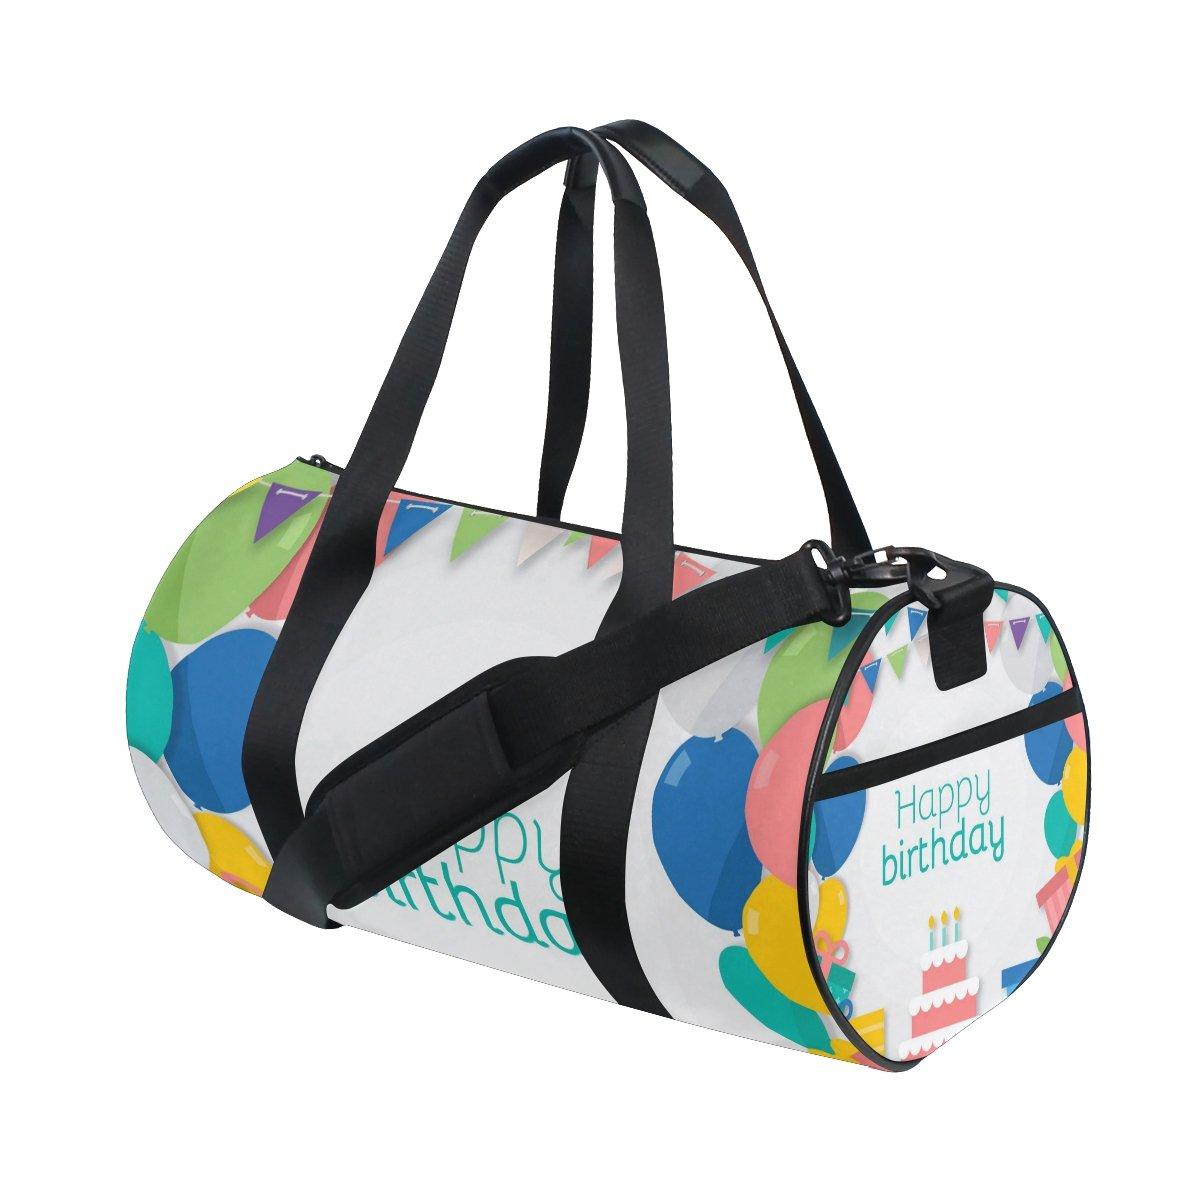 JIUMEI Colorful Balloon Gift Box Happy Birthday Party Lightweight Canvas Sports Bag Travel Duffel Yoga Gym Bags Shoulder Bag for Women Men Girls Boys